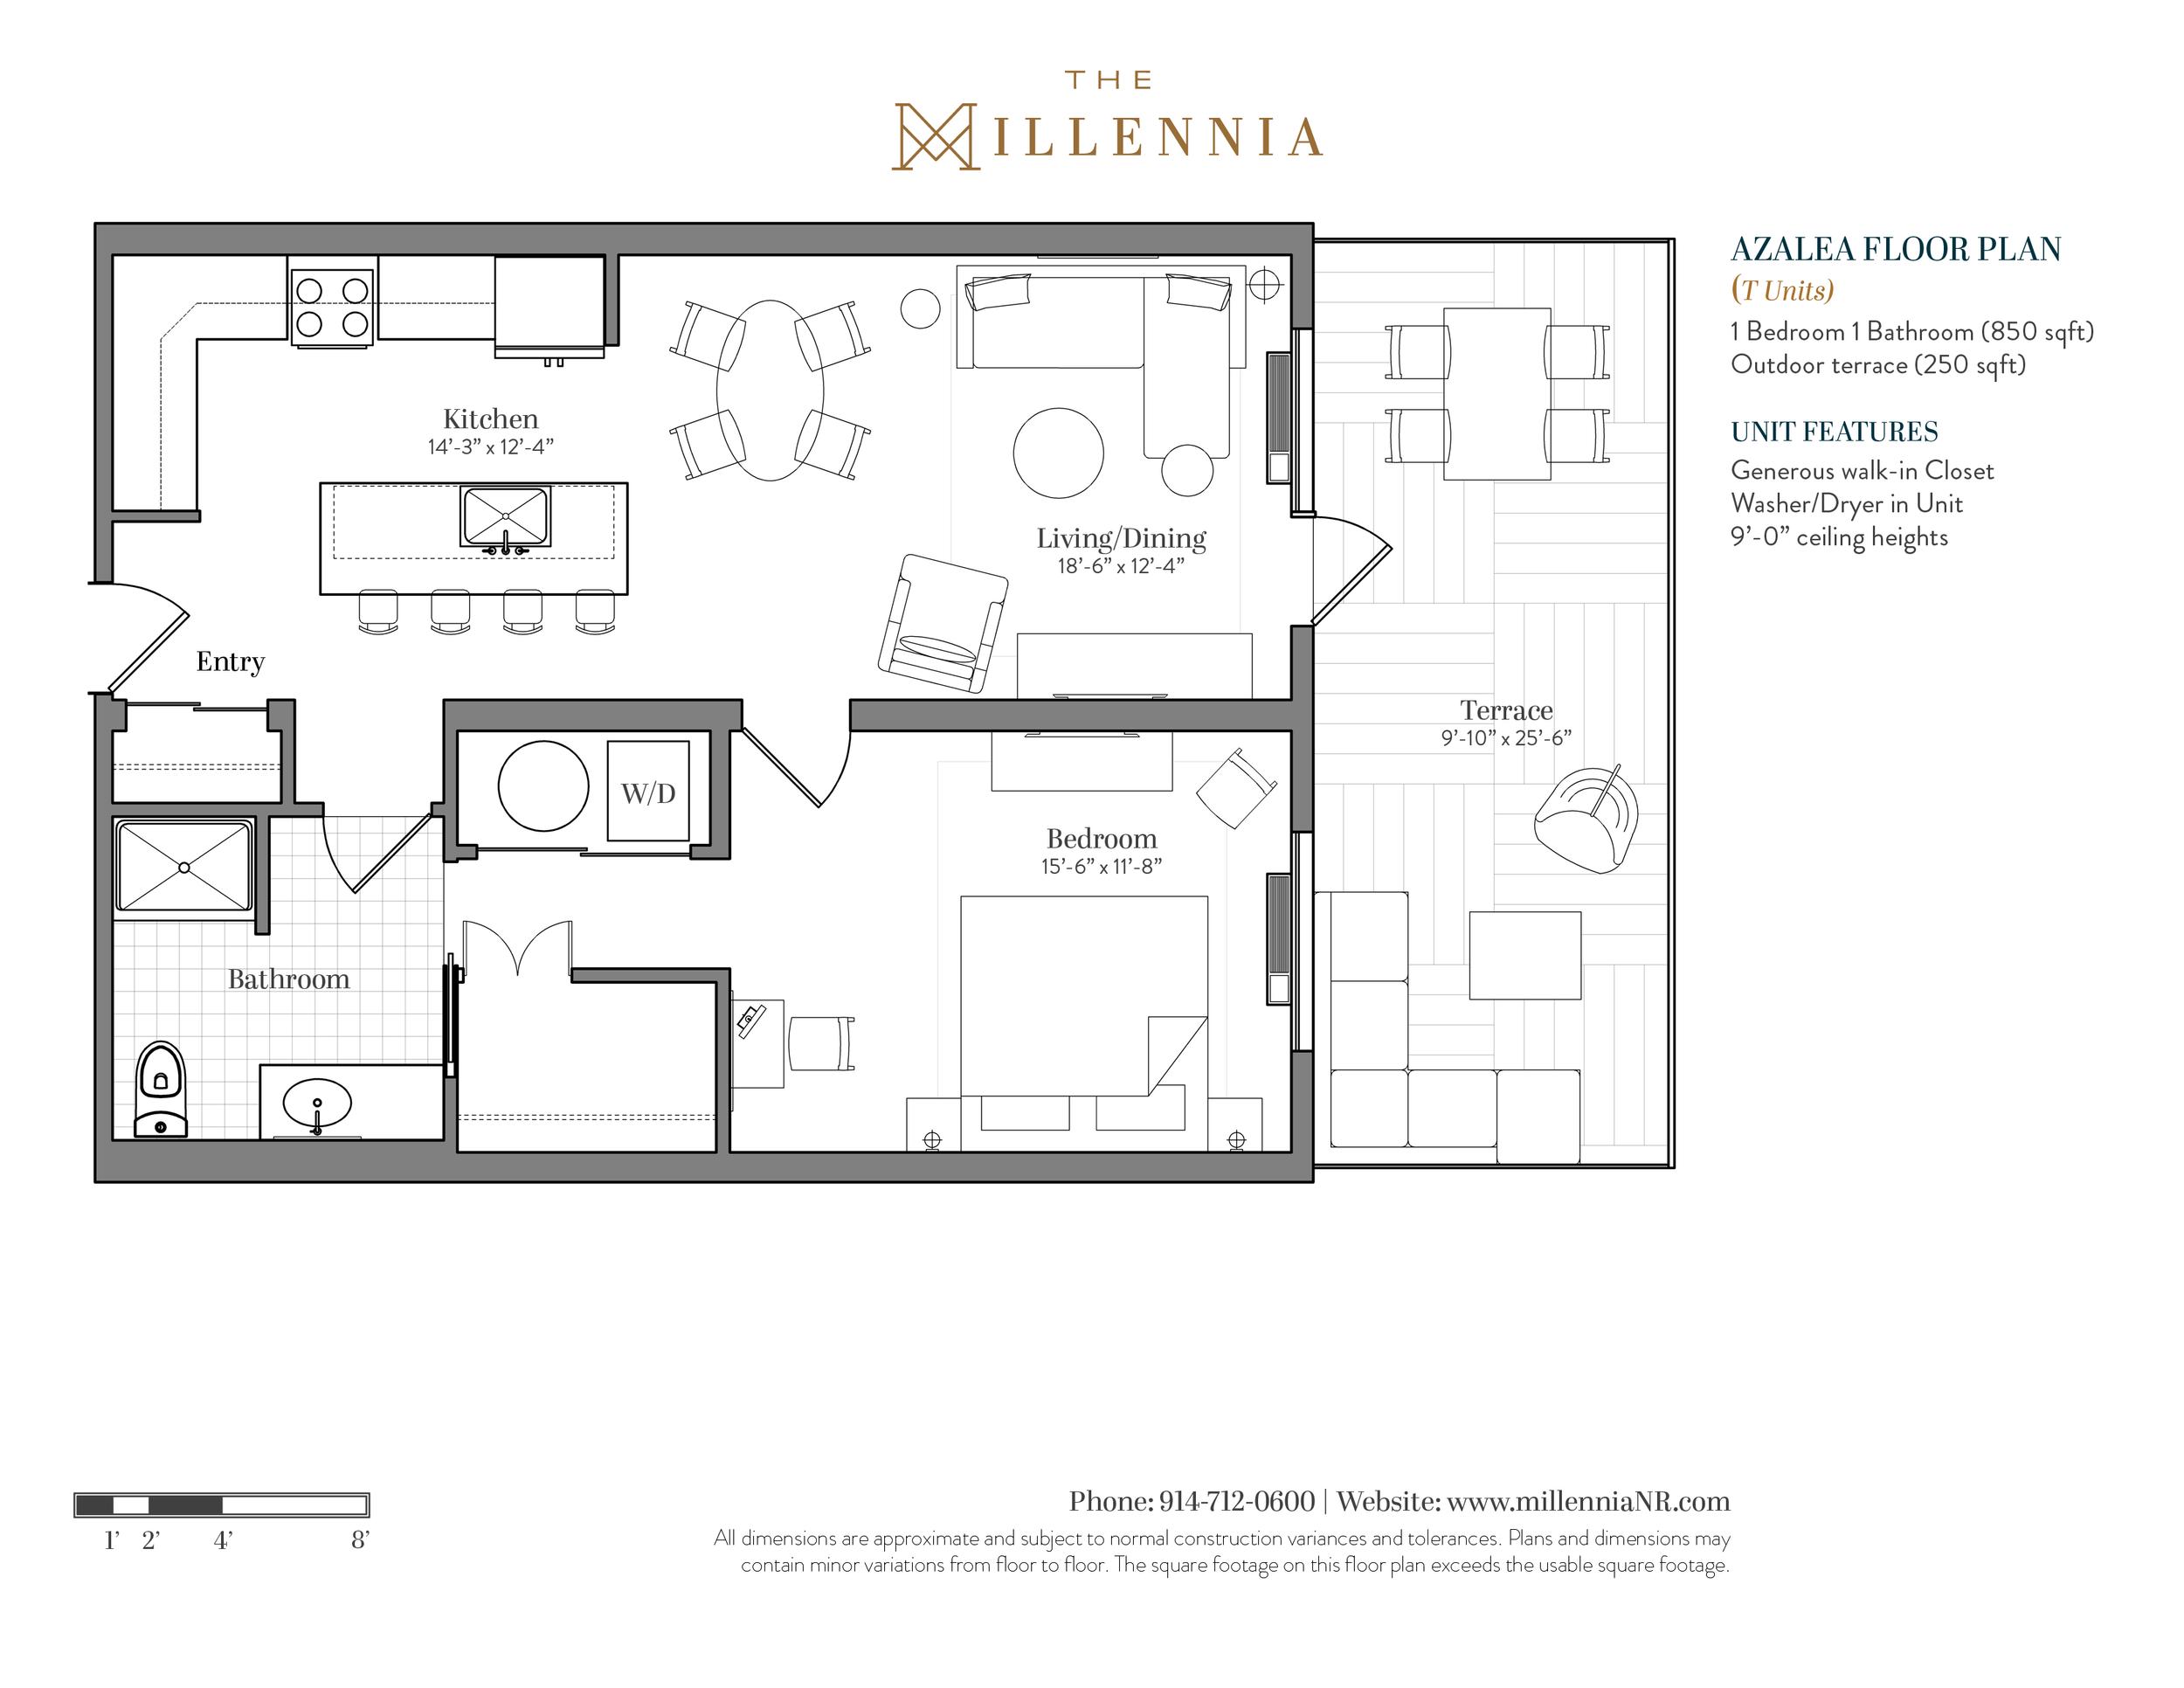 Millennia_Floorplans_Azalea.png